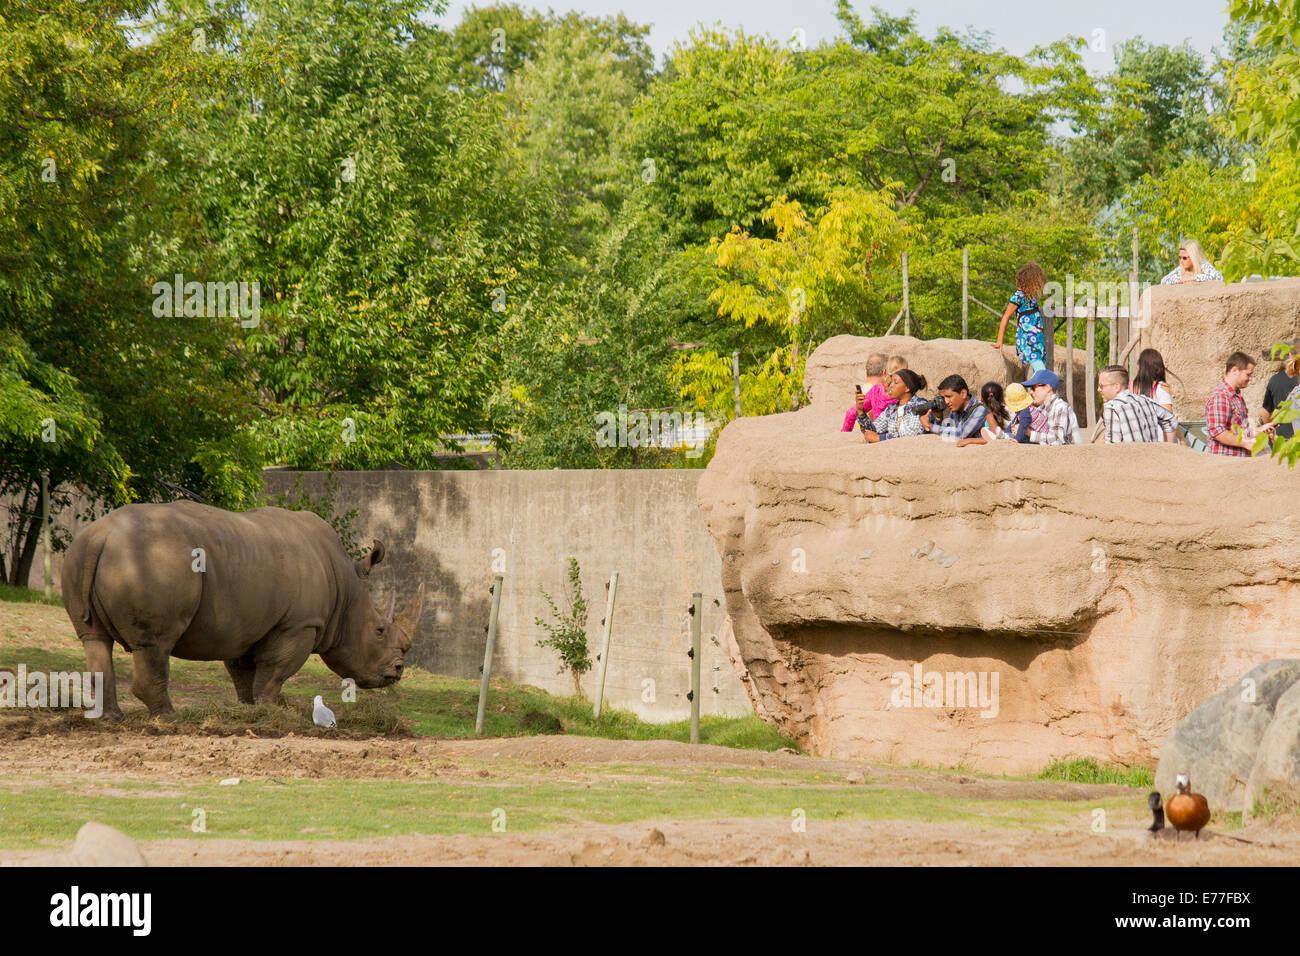 endangered-white-rhinoceros-eating-hay-a